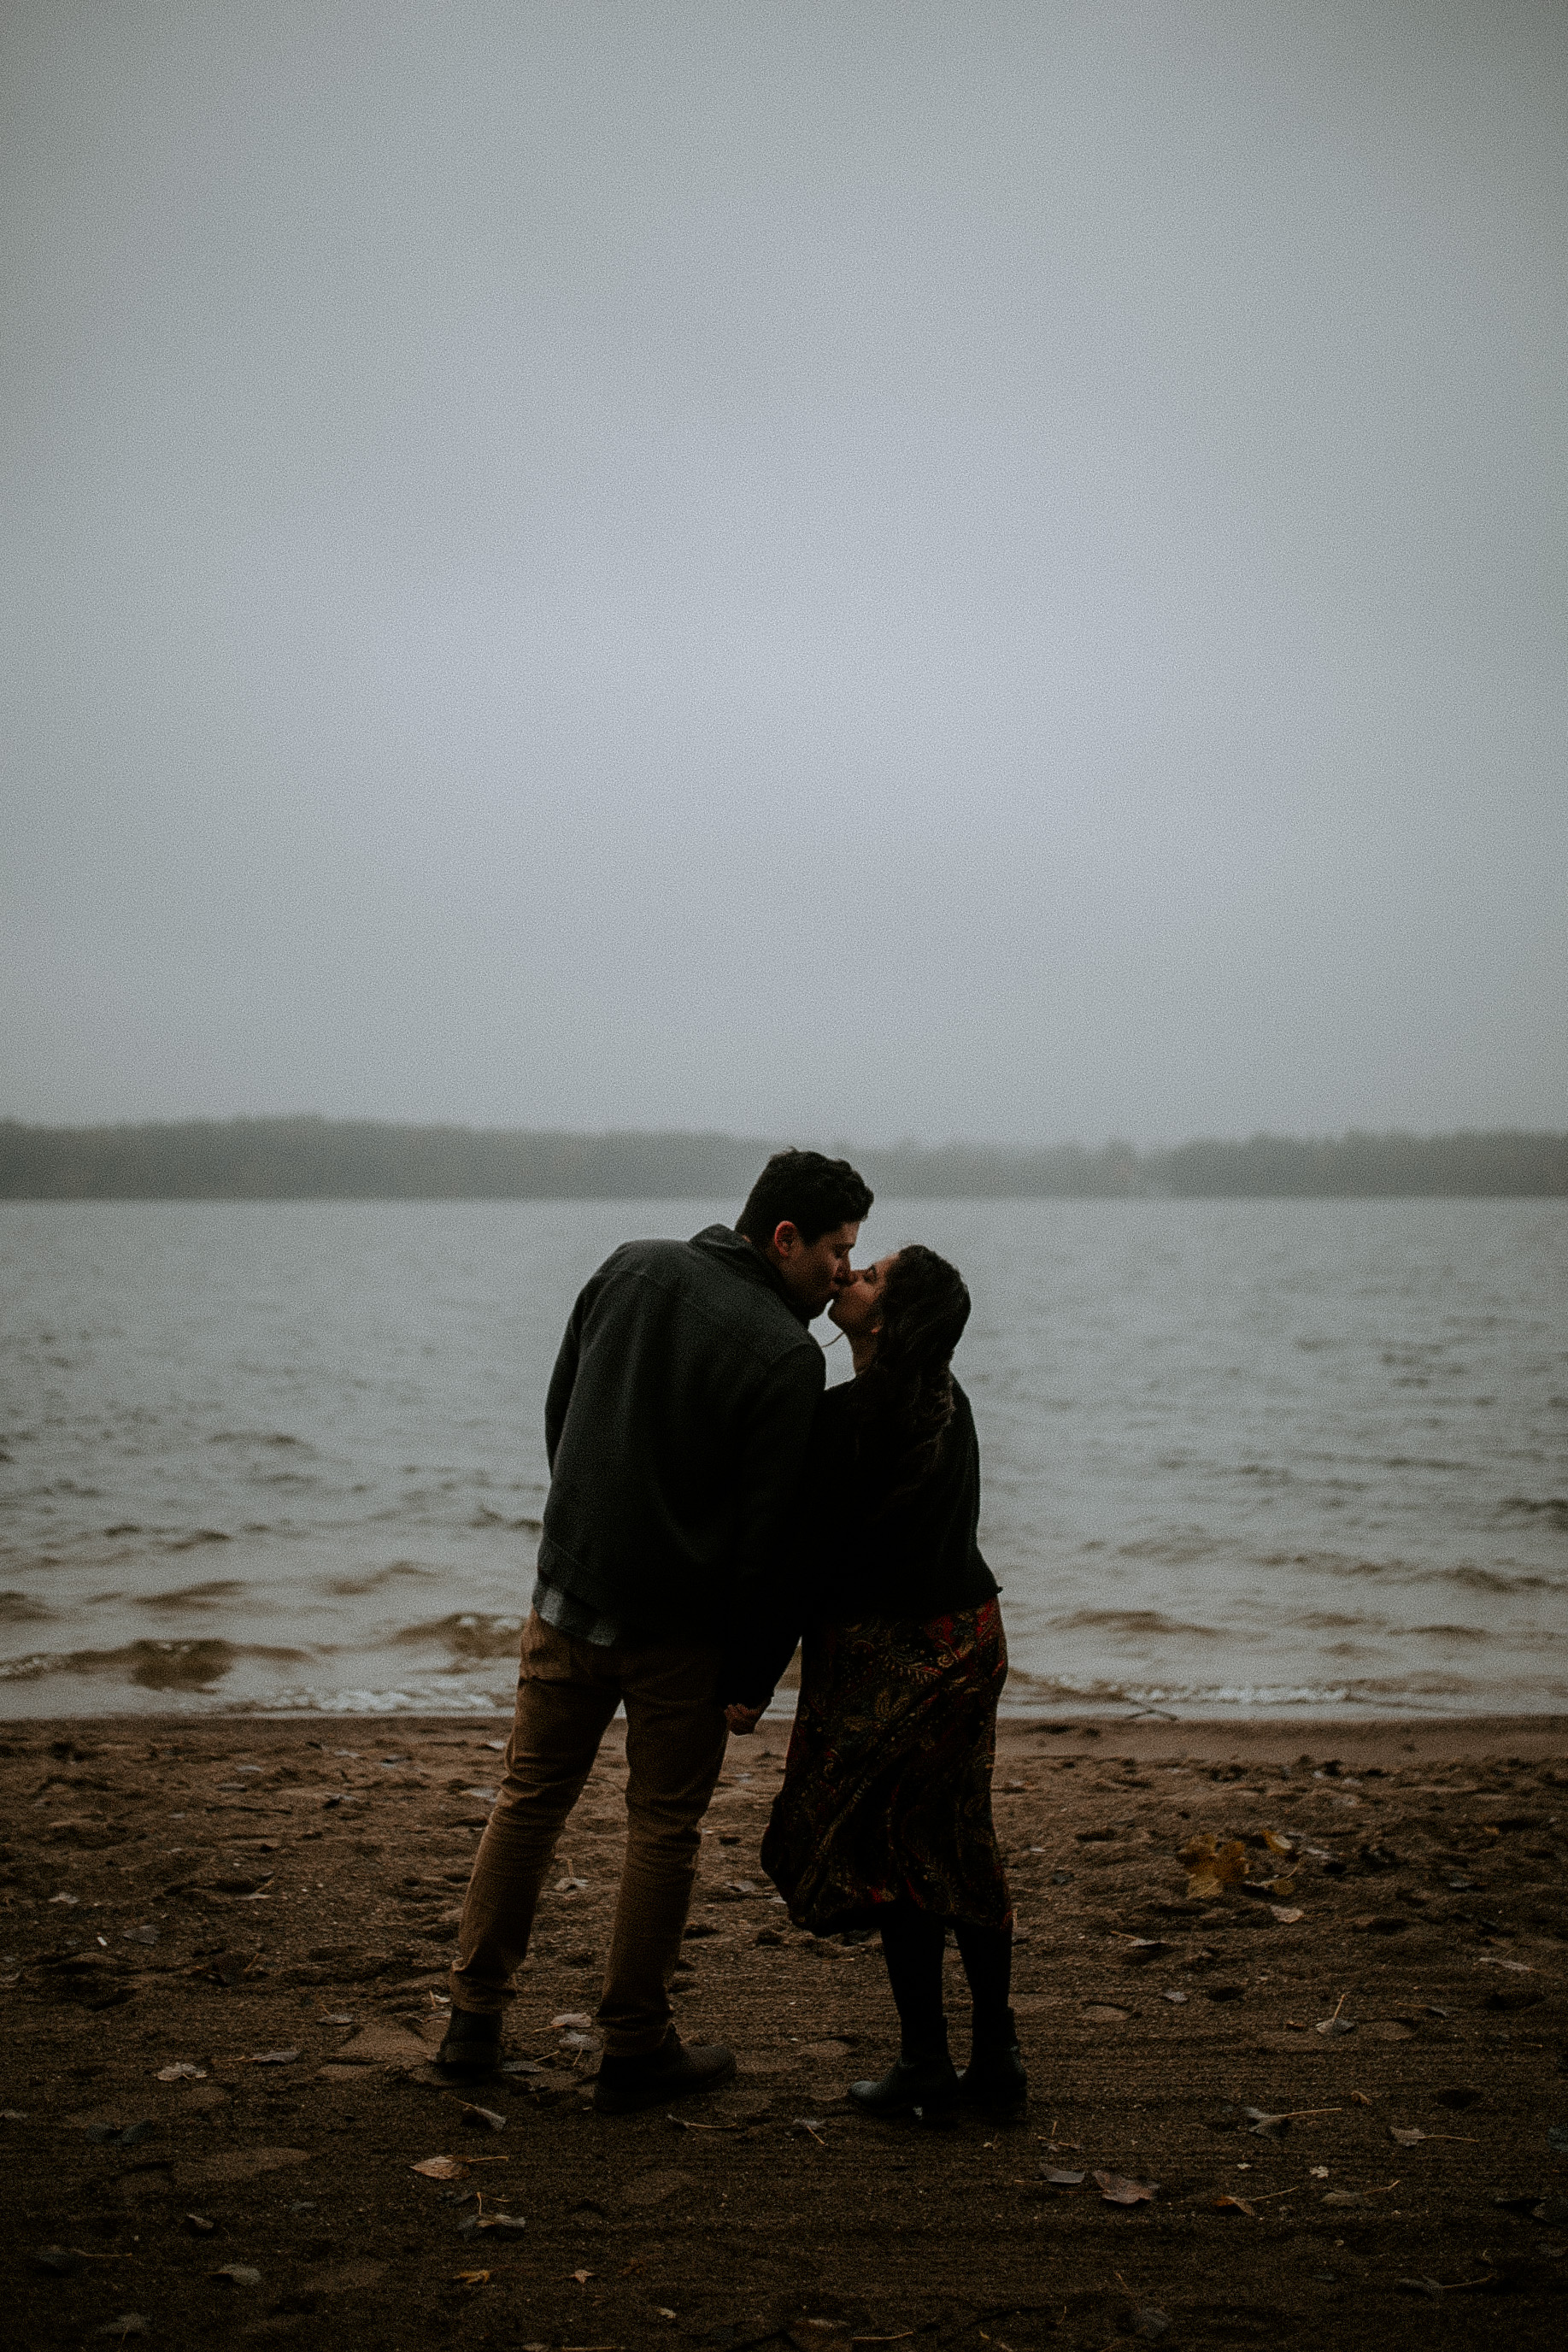 STEPH+DAN-COUPLE-REAGANLYNNPHOTOGRAPHY-PRAIRIECREEKRESERVOIR-MUNCIE-INDIANA-18.jpg